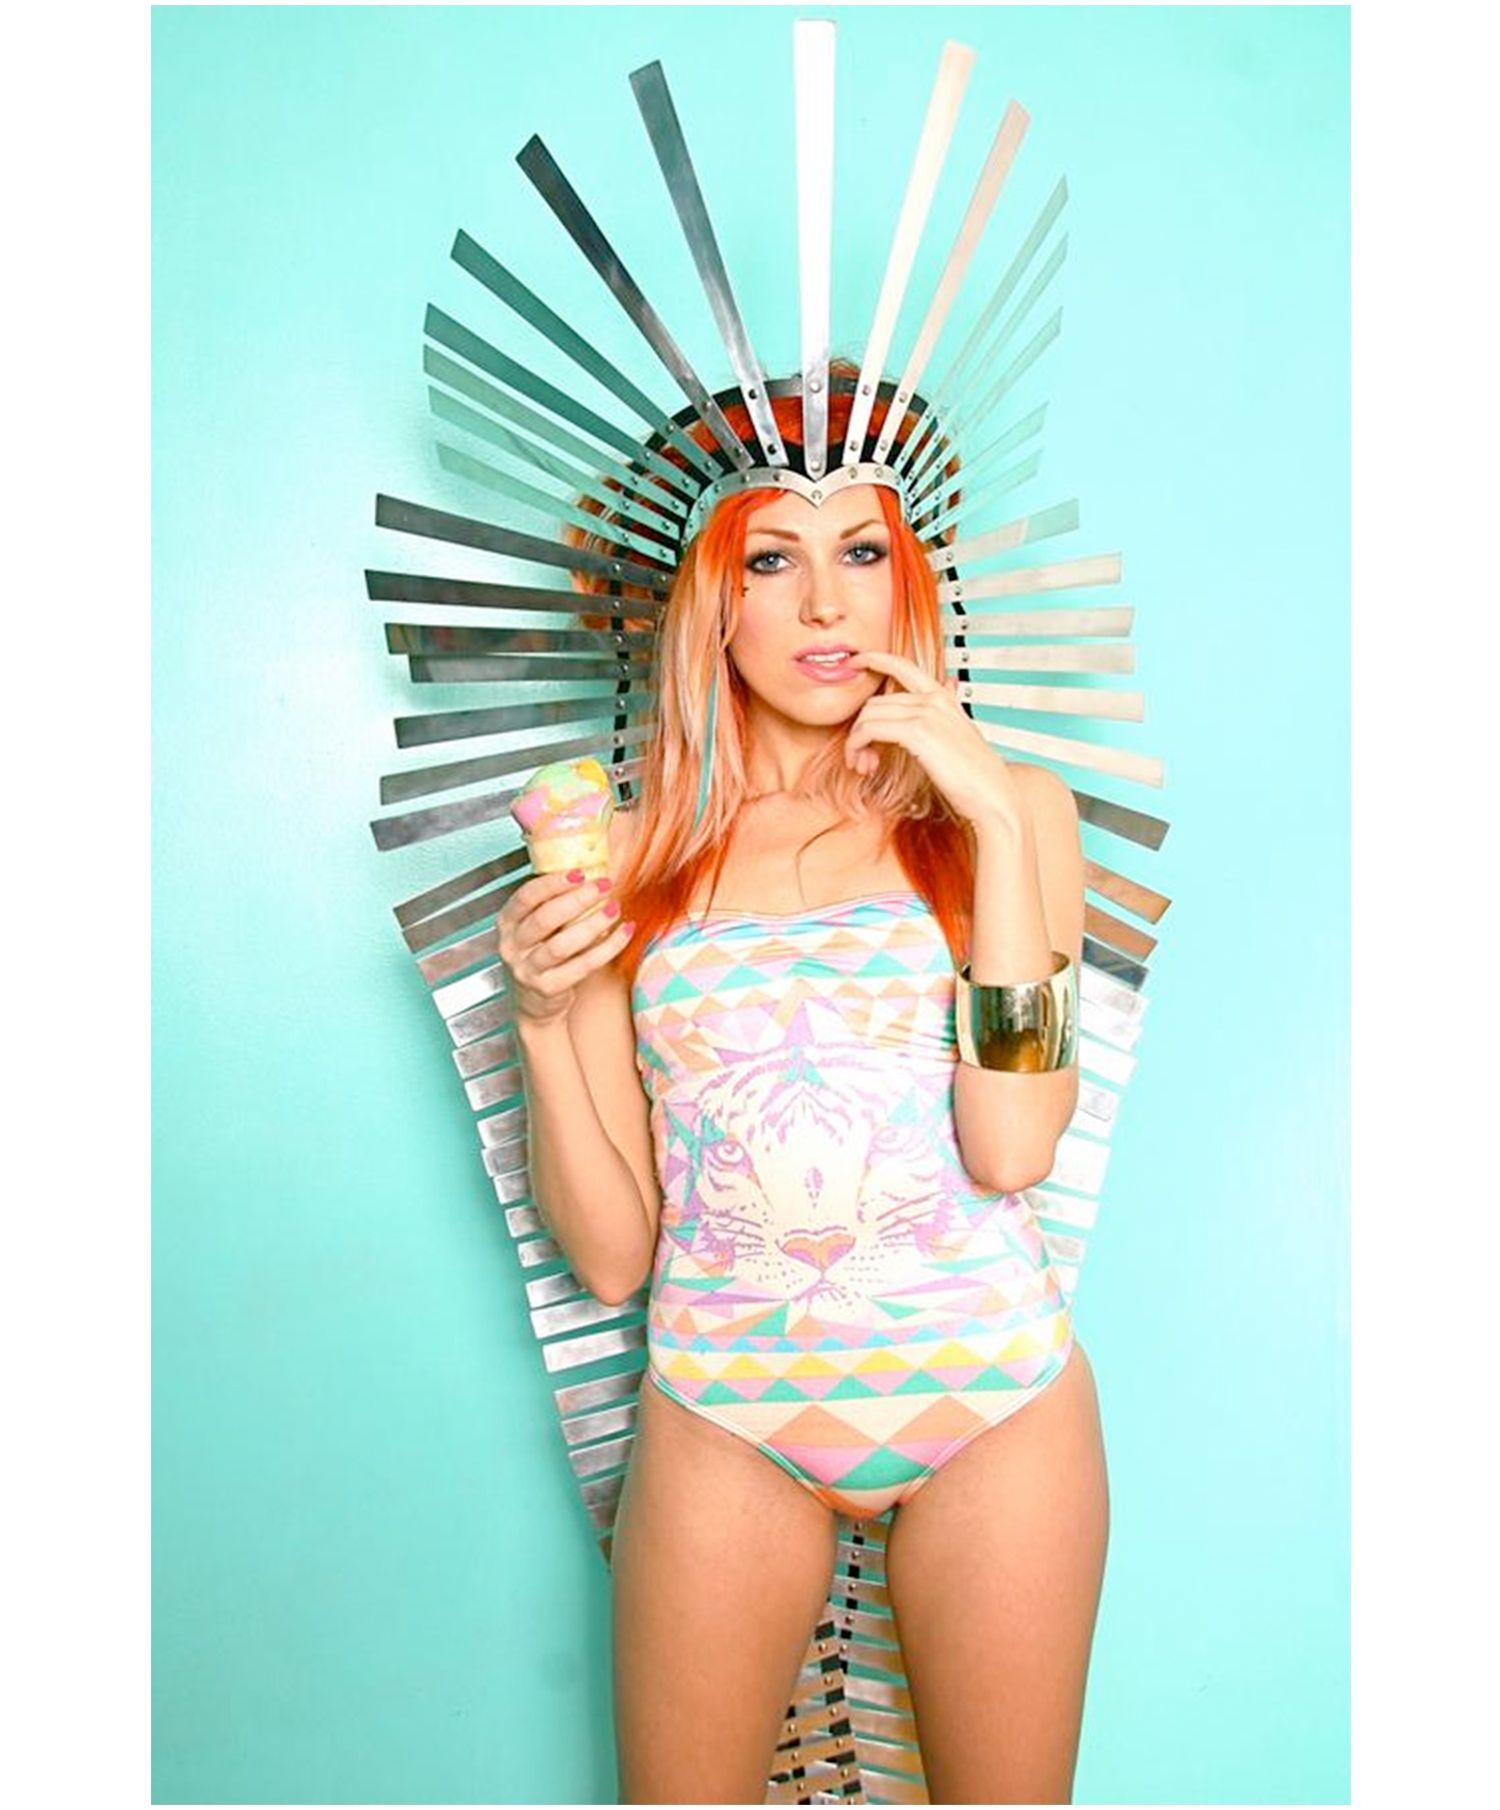 Bonnie McKee has co-written songs for Katy Perry, Britney Spears, Ke$ha, Carly Rae Jepsen, Christina Aguilera, Kelly Clarkson, and Taio Cruz